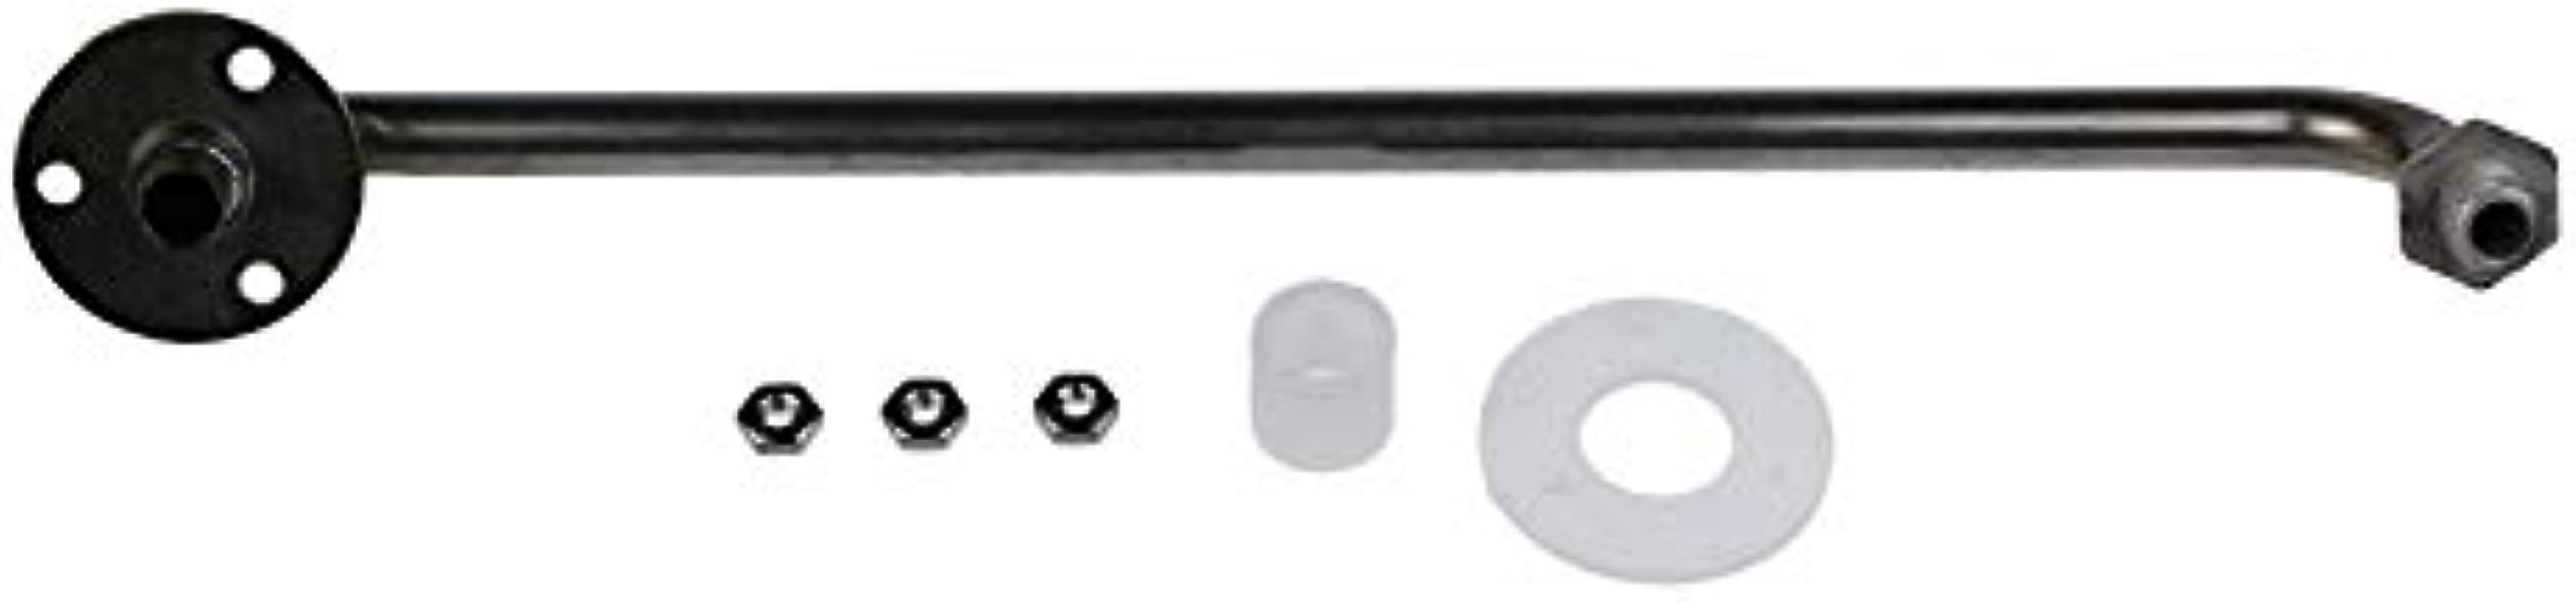 Bunn 11431 0002 Sprayhead Tube Kit C Cw Vp17